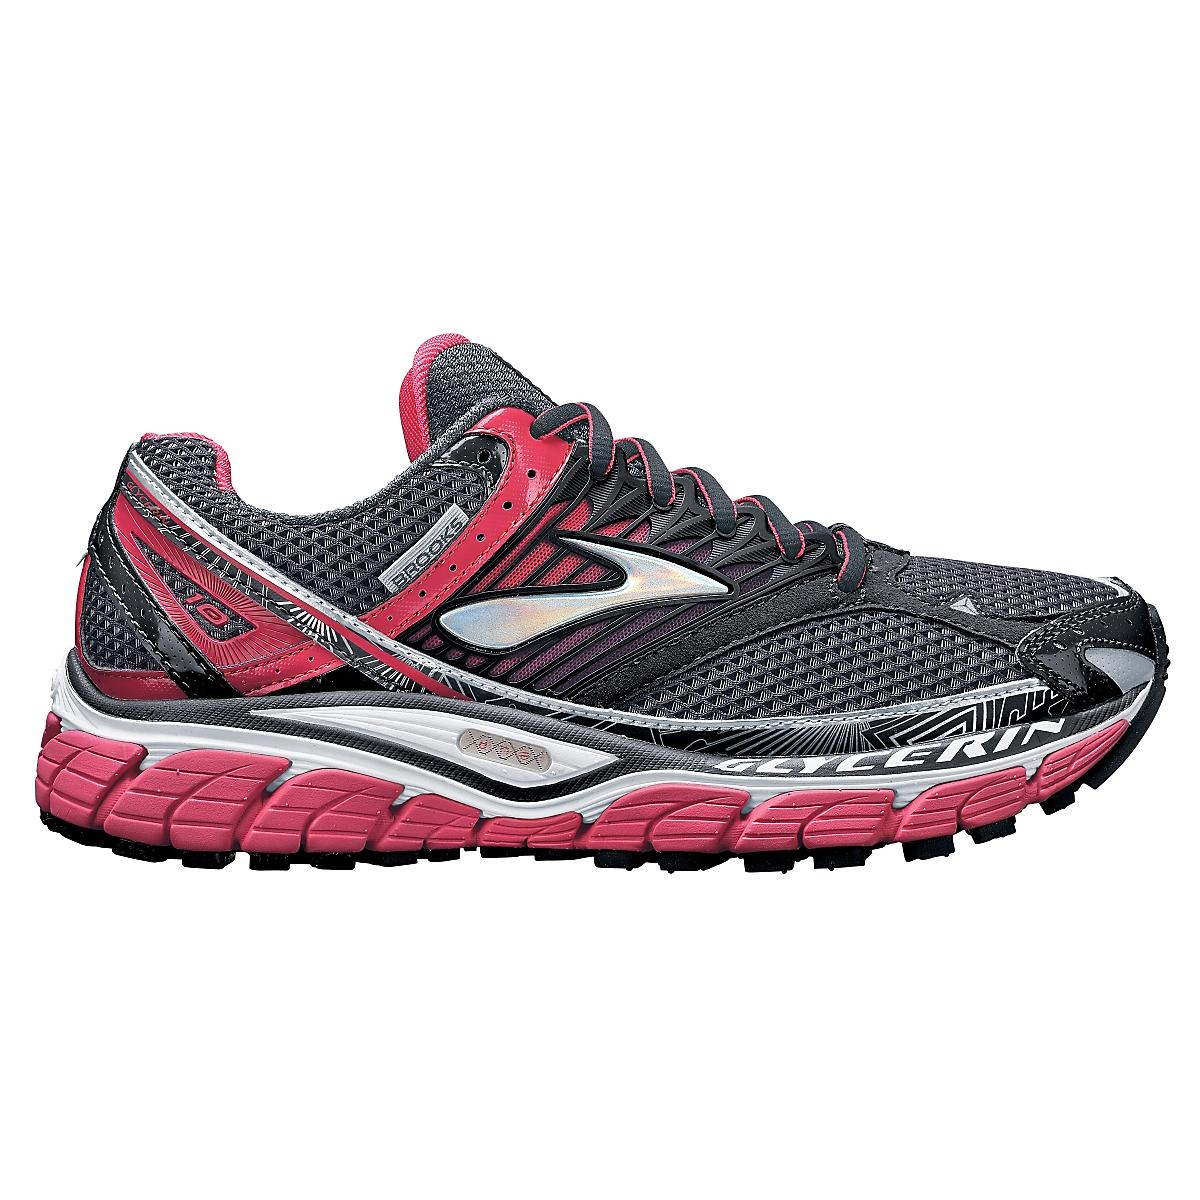 d9d9b00eb55 Womens Brooks Glycerin 10 Running Shoe at Road Runner Sports